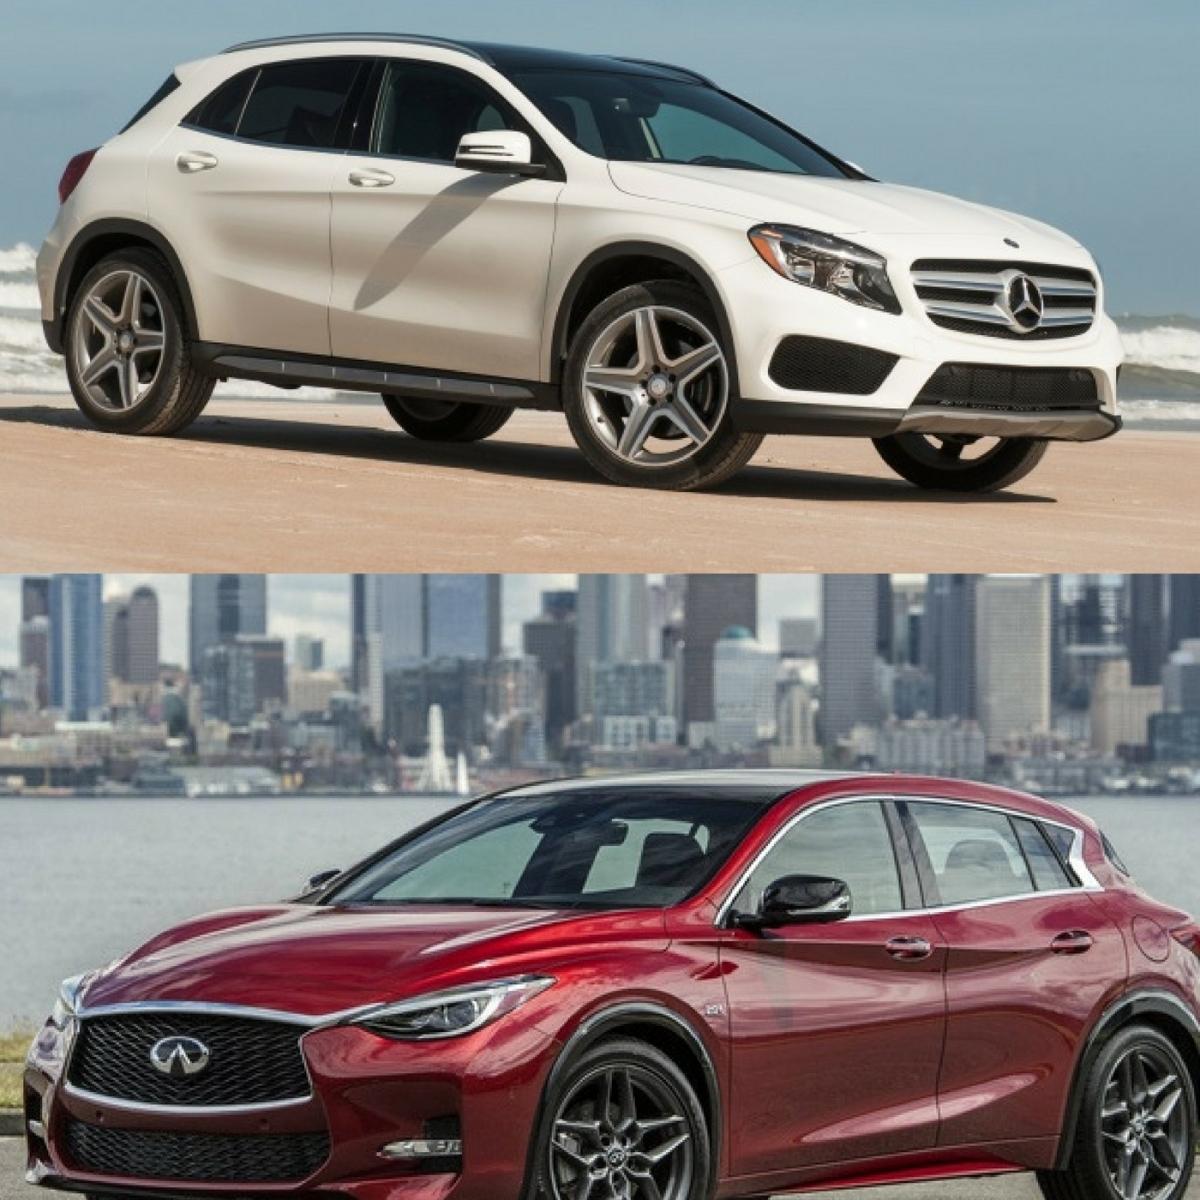 Mercedes-Benz GLA Class VS. Infiniti QX30 Comparison